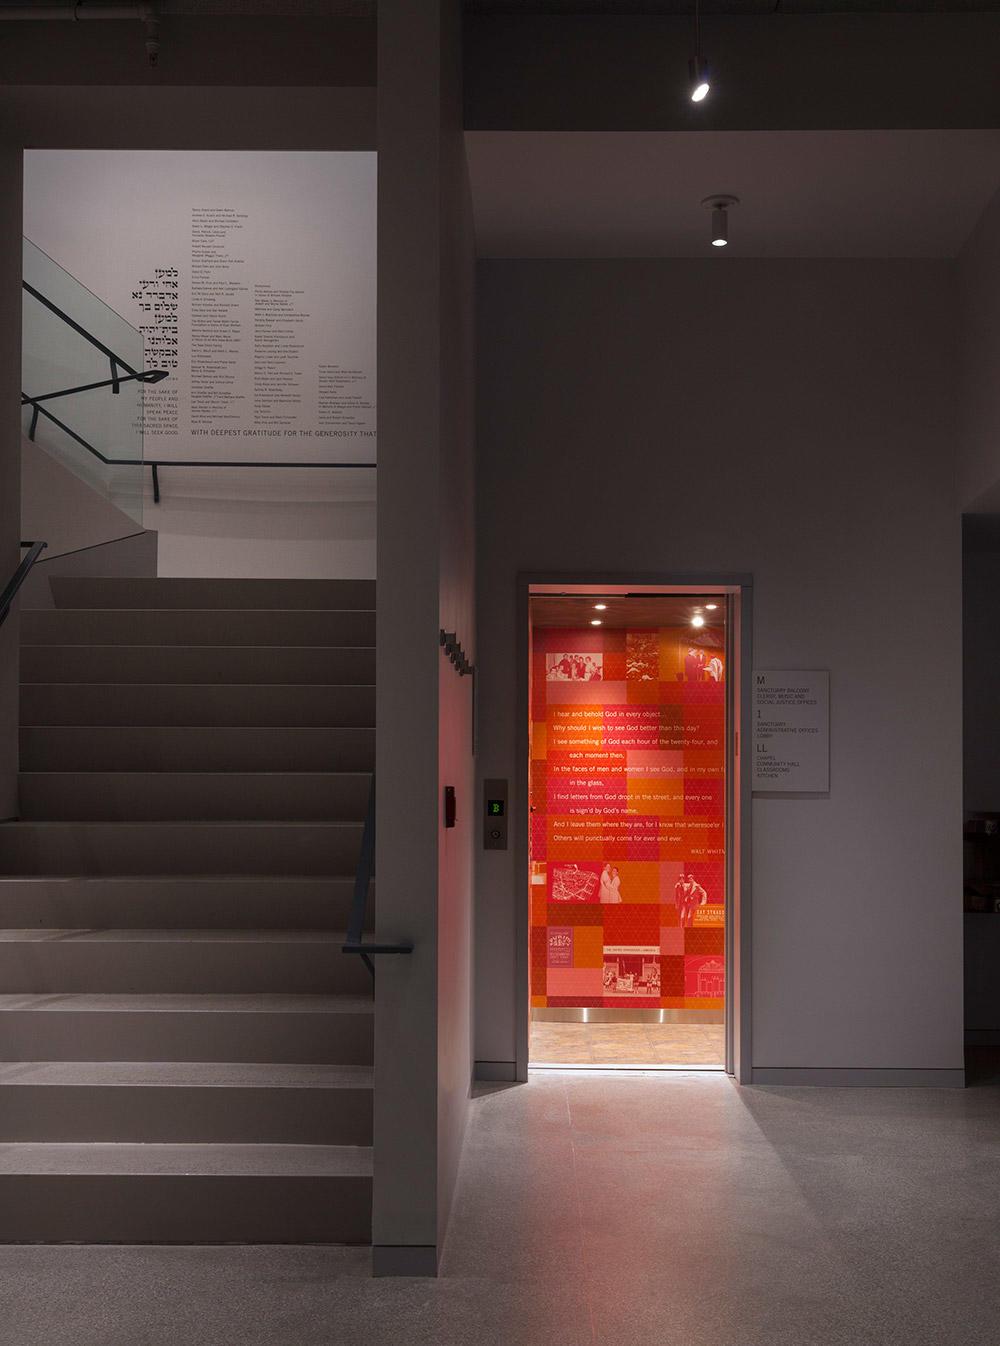 Elevator cab graphics